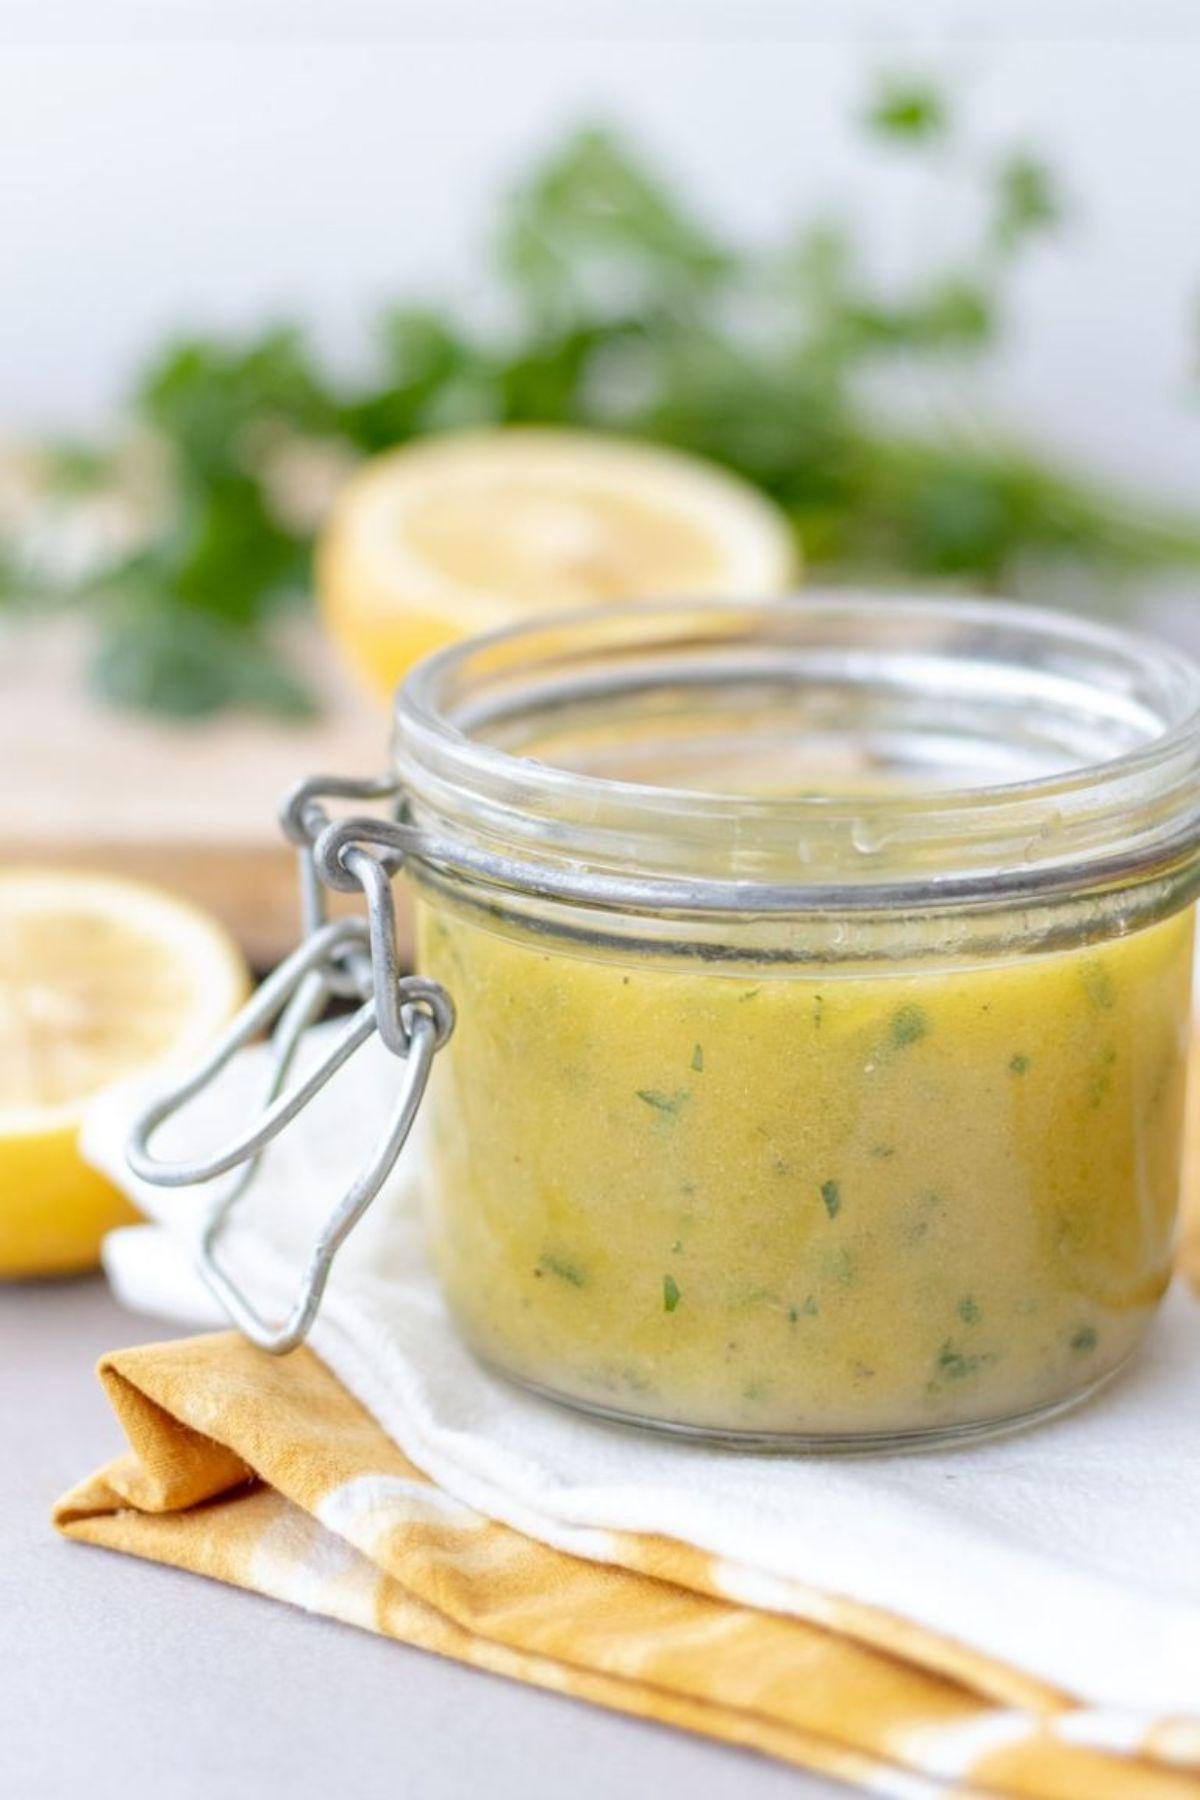 A kilner jar with clip full of lemon herb vinaigrette with lemons and hebrs just seen in the background